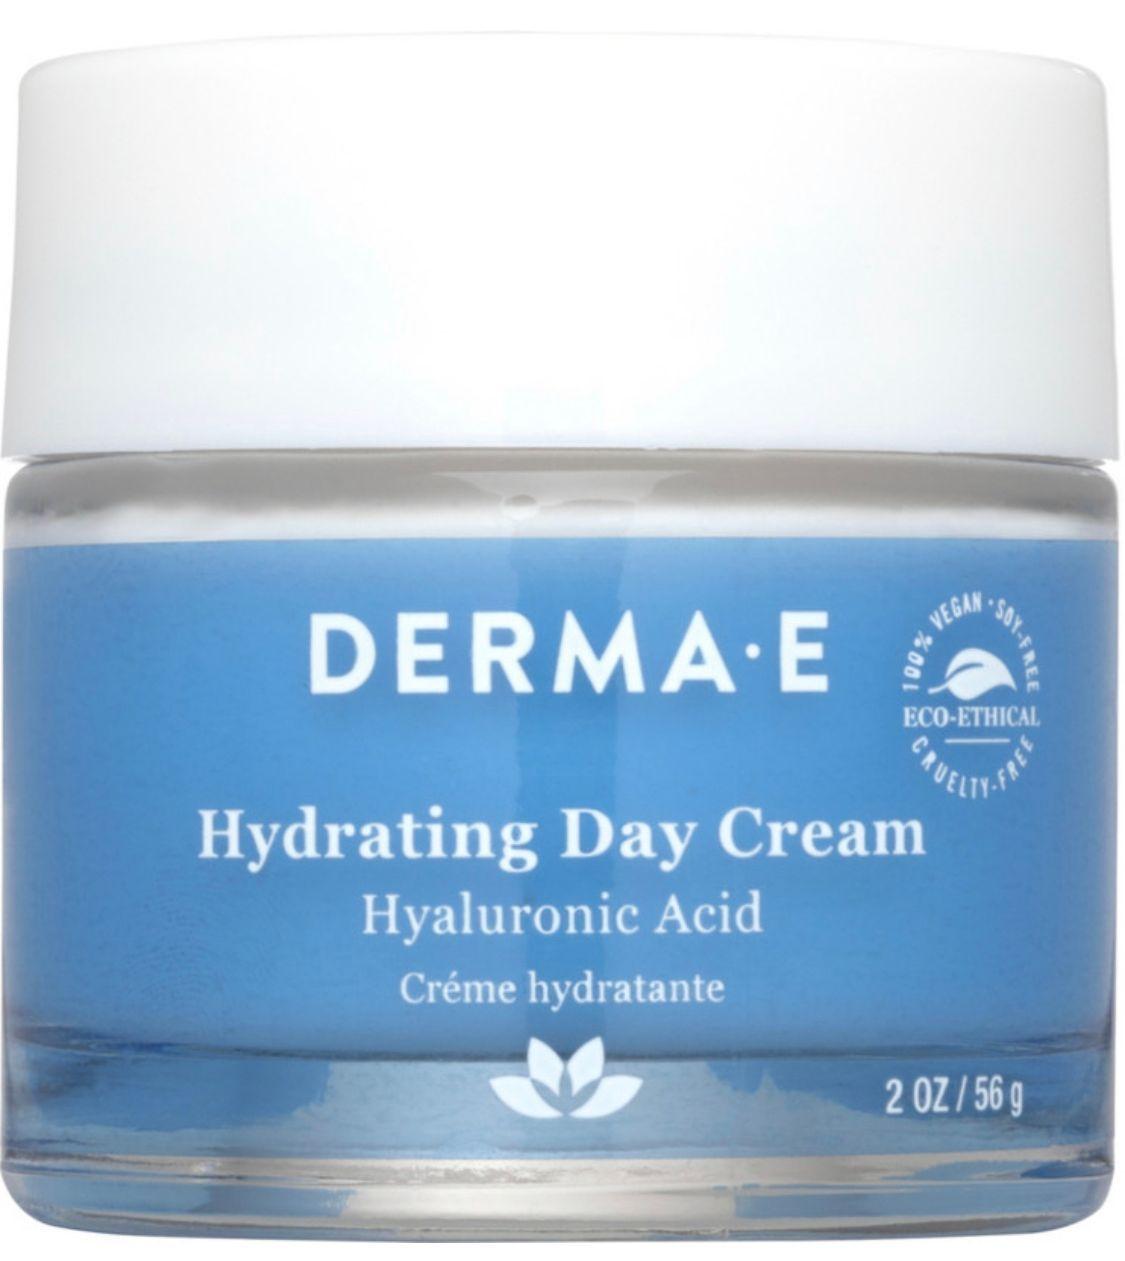 Hydrating Day Cream Hyaluronic Acid & Green Tea